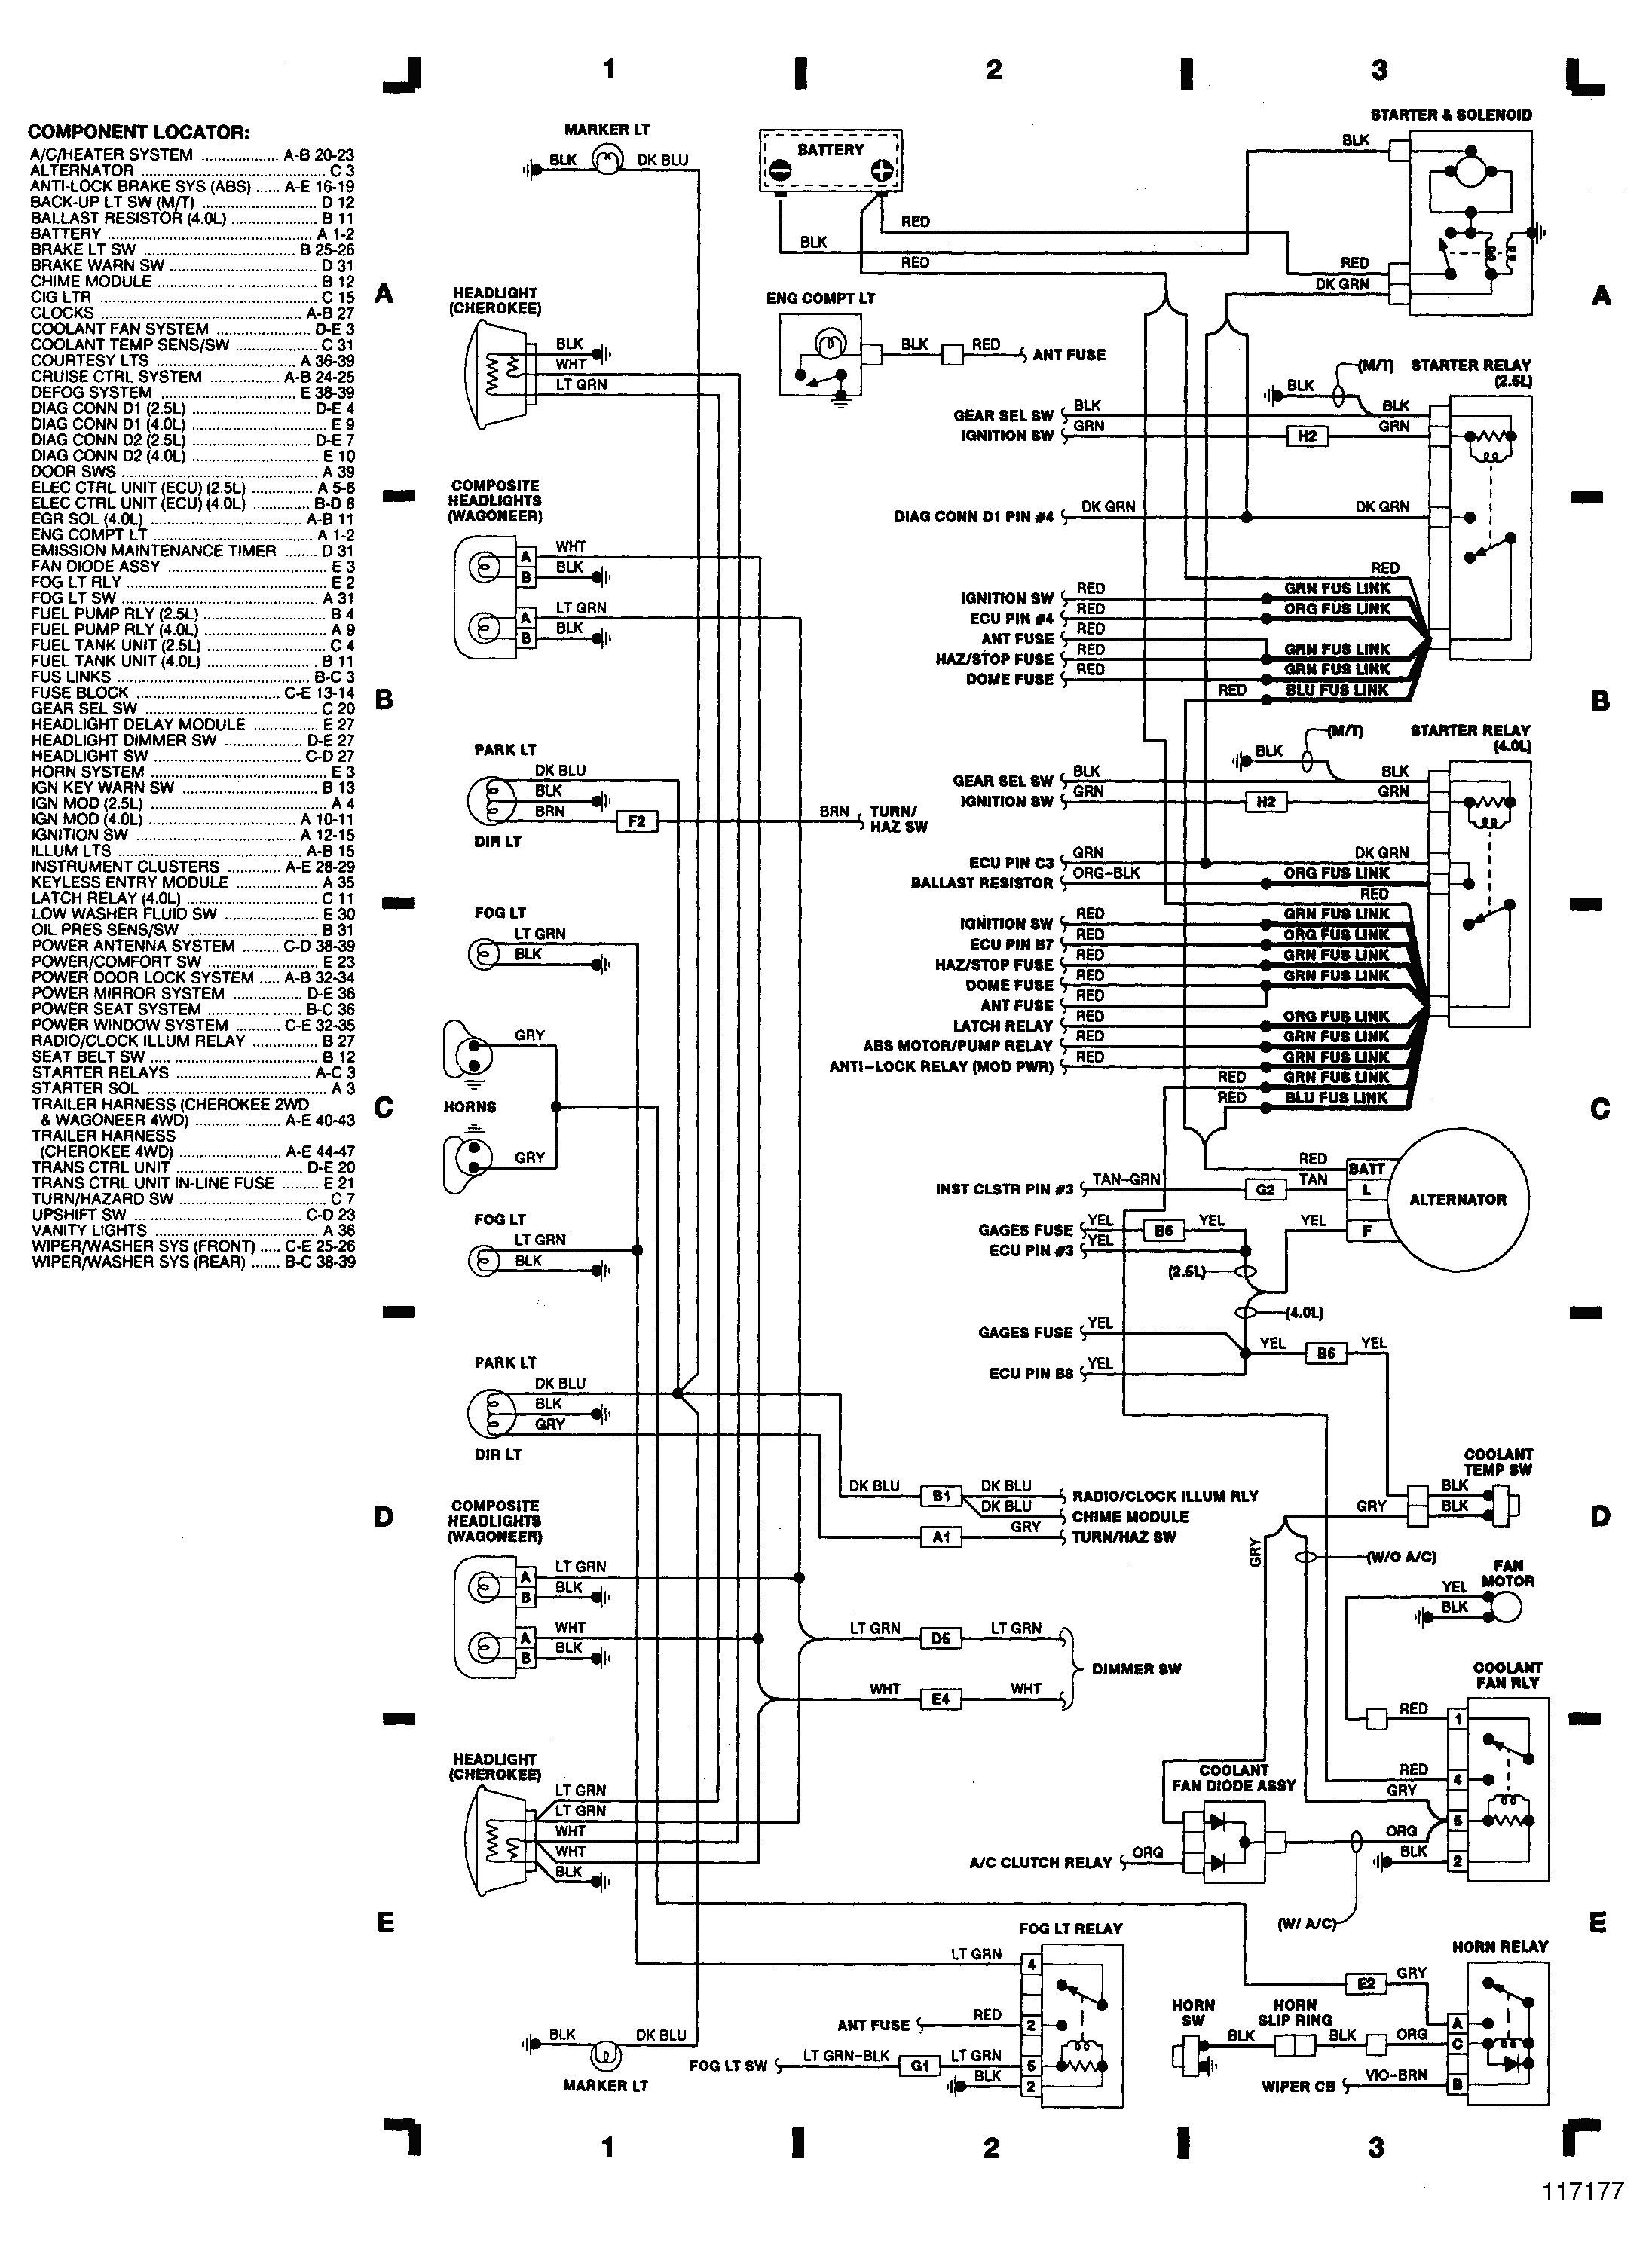 john deere gator wiring diagram free wiring diagram. Black Bedroom Furniture Sets. Home Design Ideas